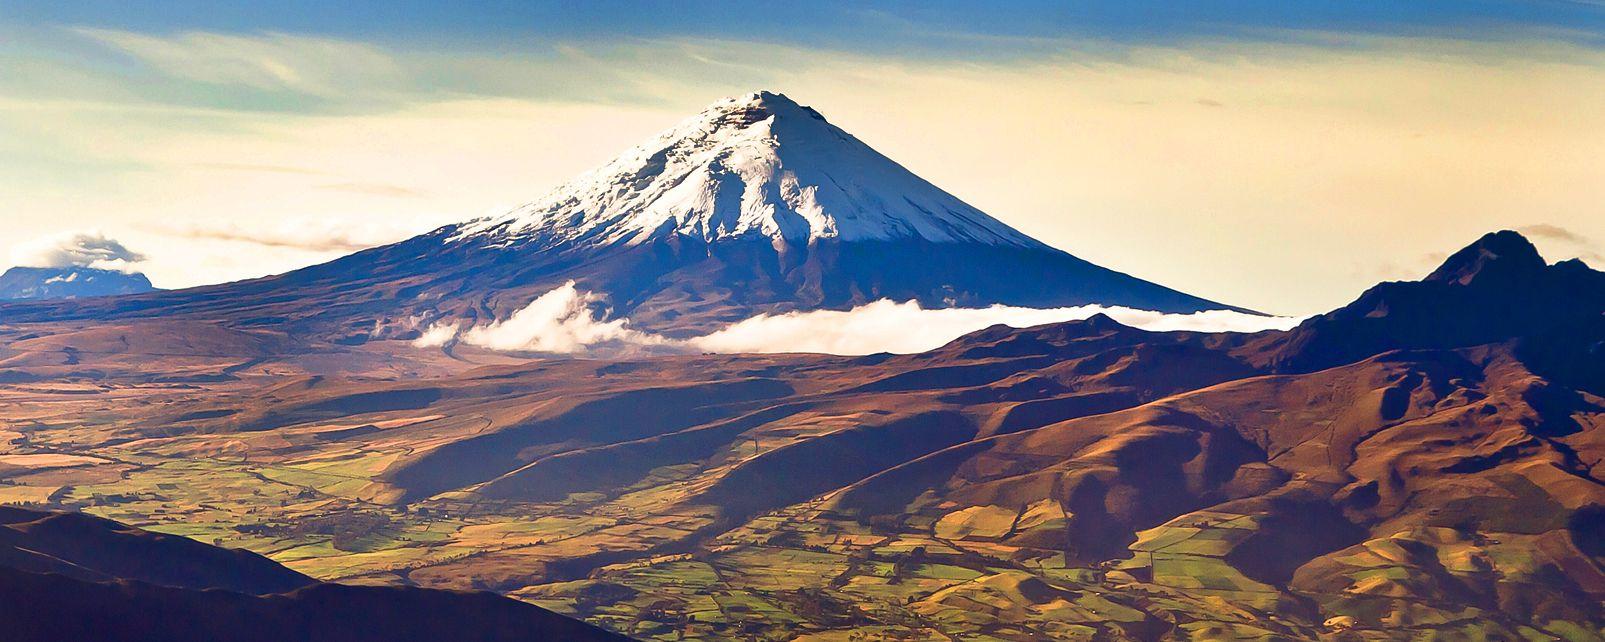 equateur-volcan